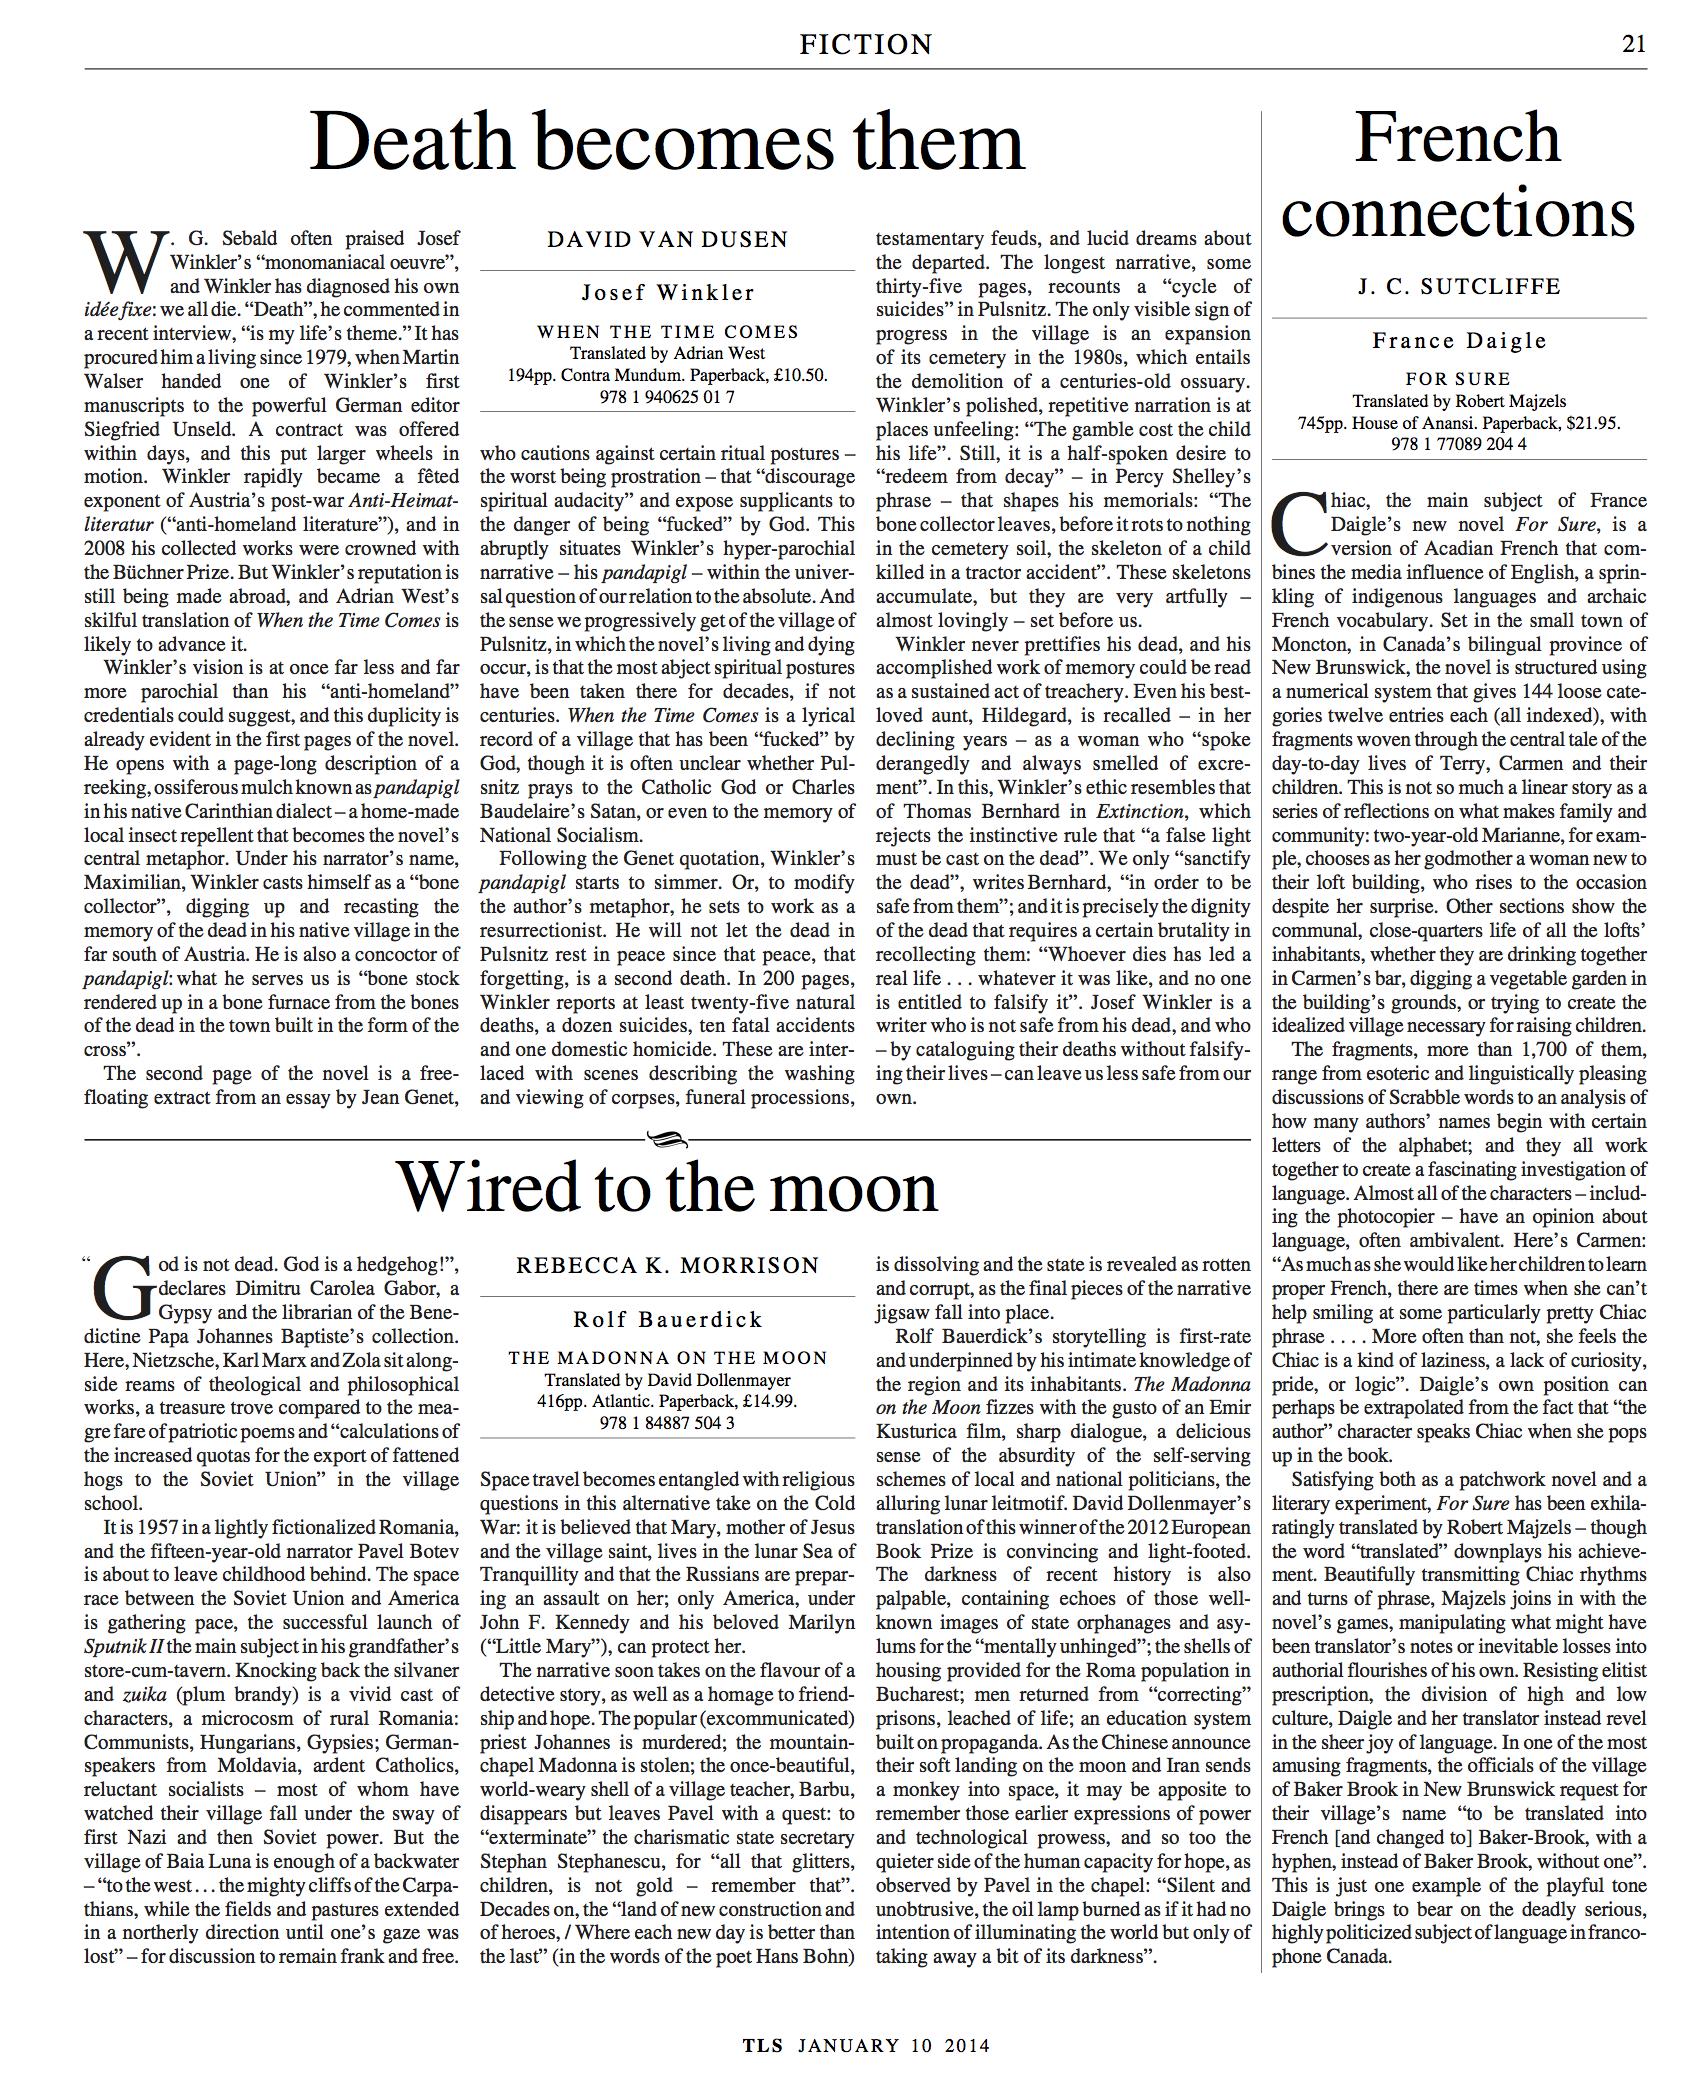 010 Essay Example Tls Josef Winkler Translate My Into Remarkable Spanish Full